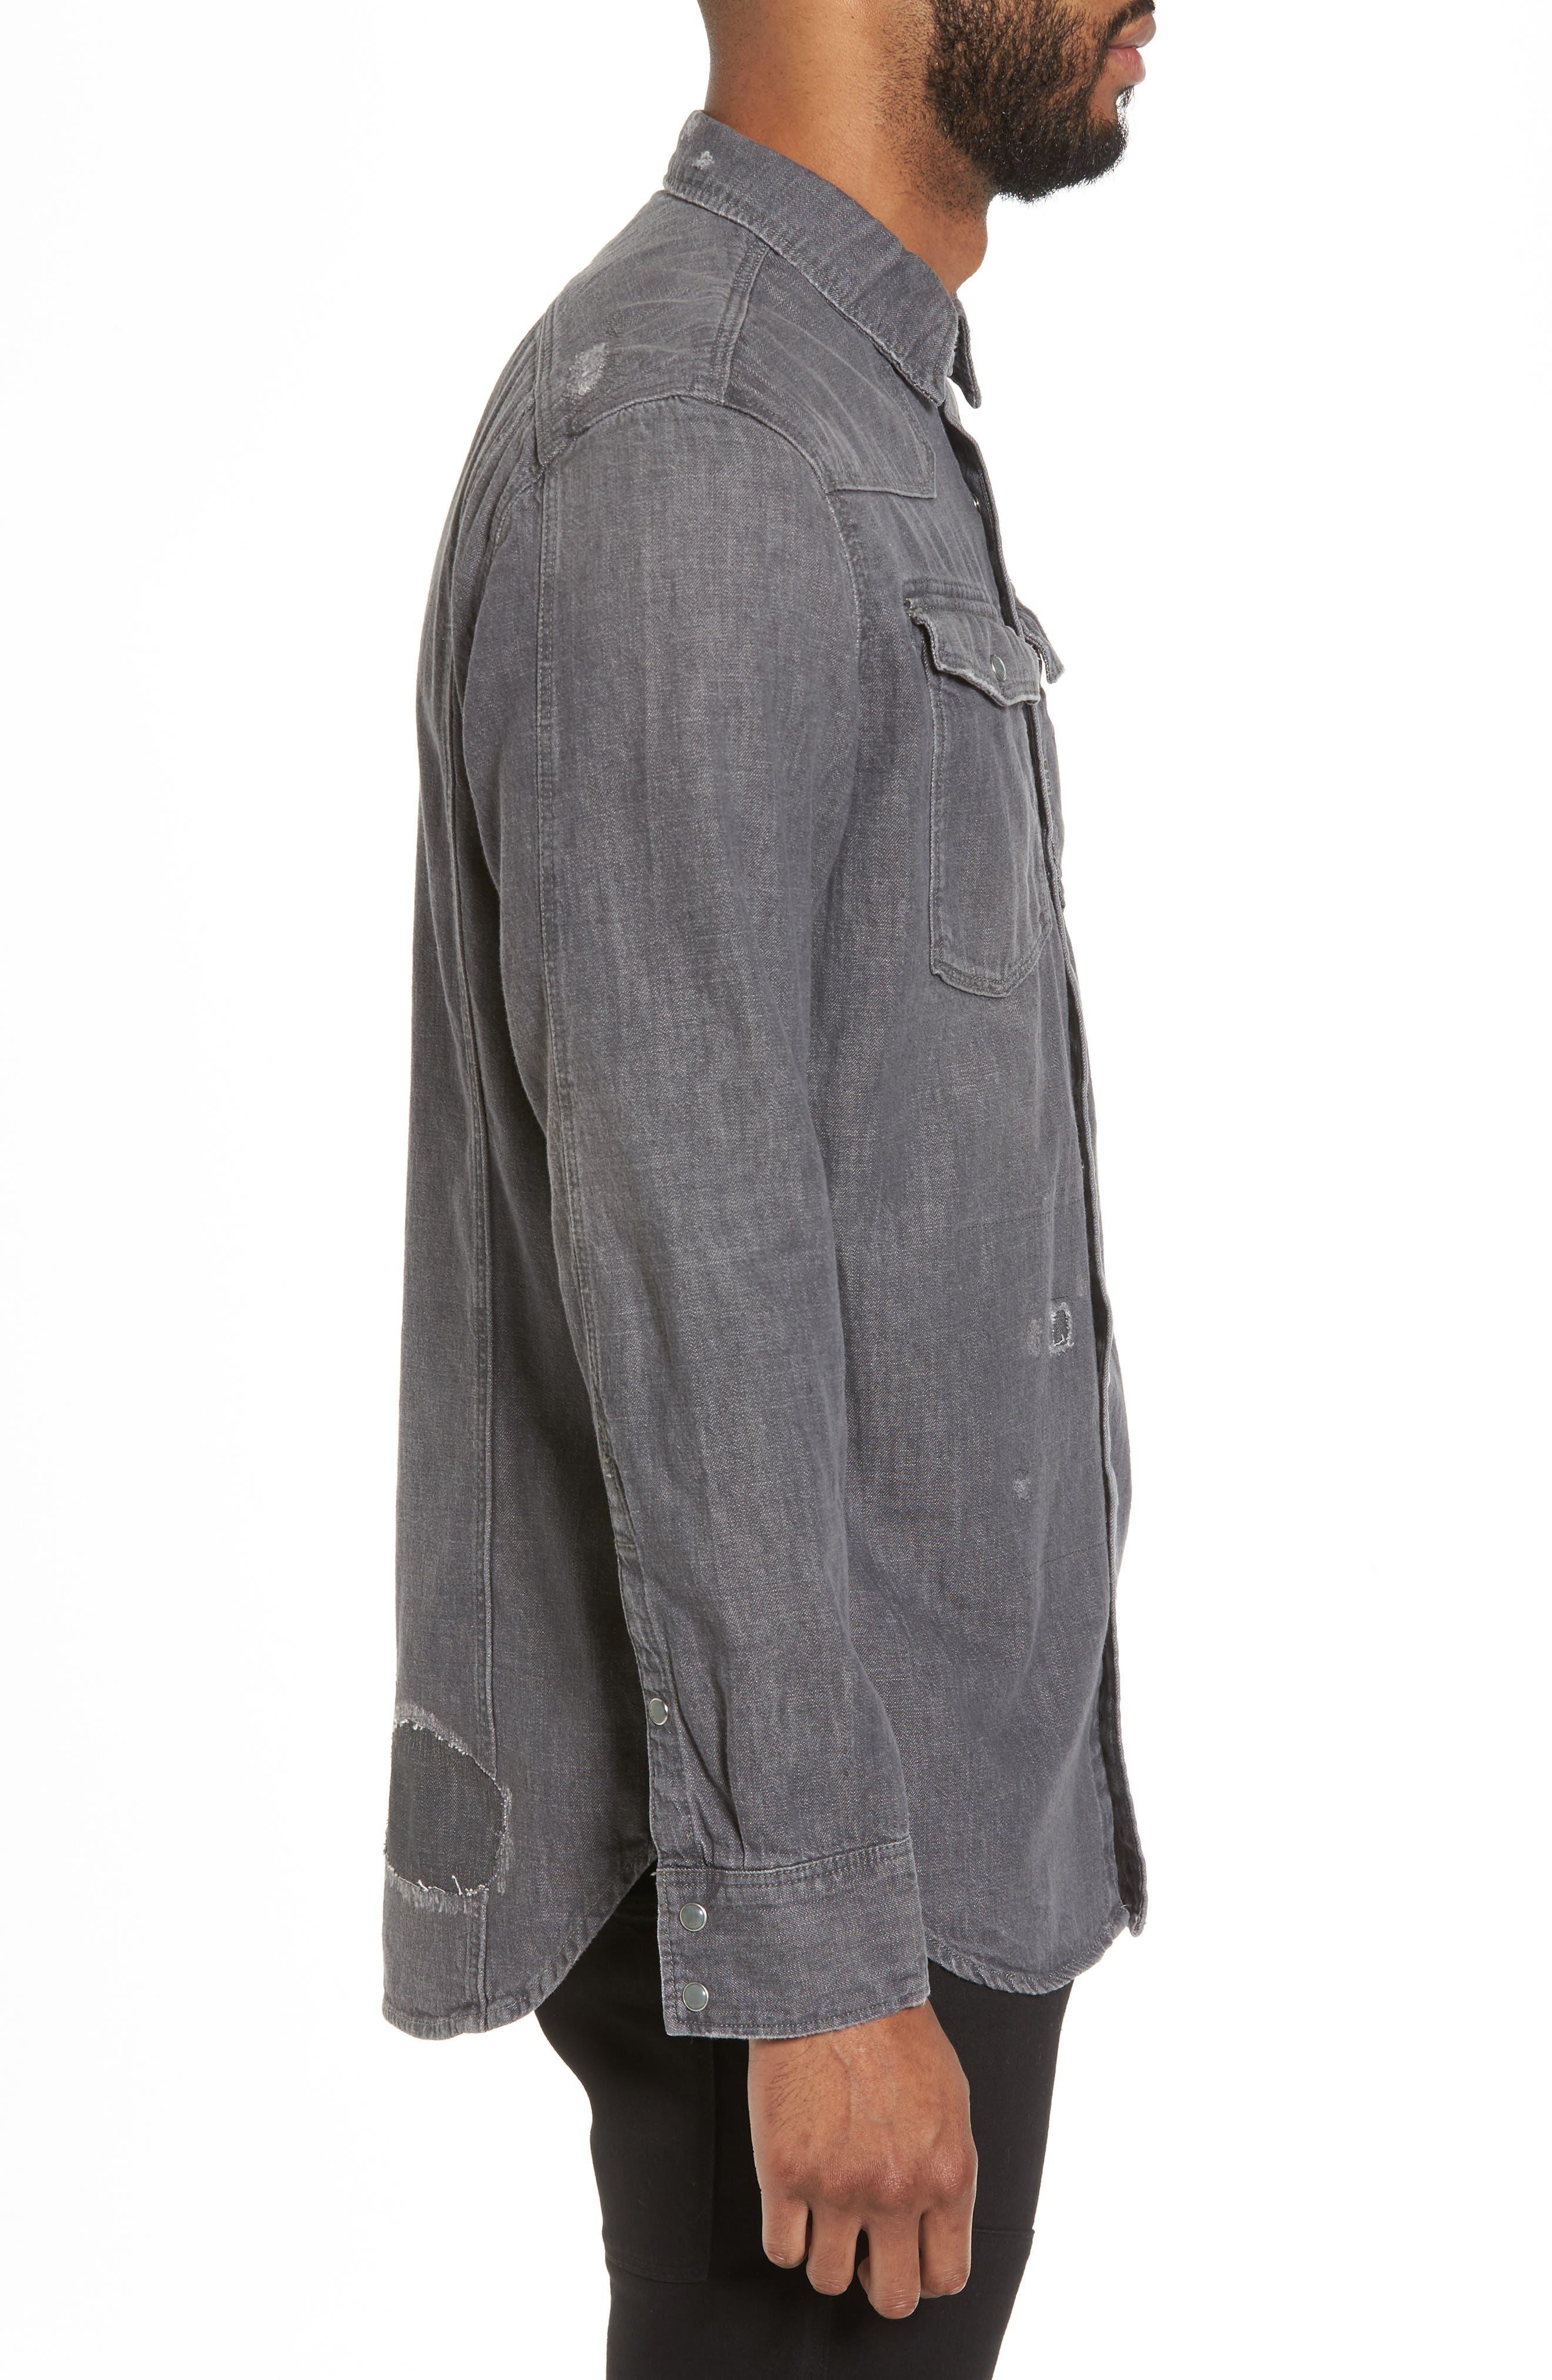 3301 Craser Denim Shirt,                             Alternate thumbnail 3, color,                             Medium Aged Restored